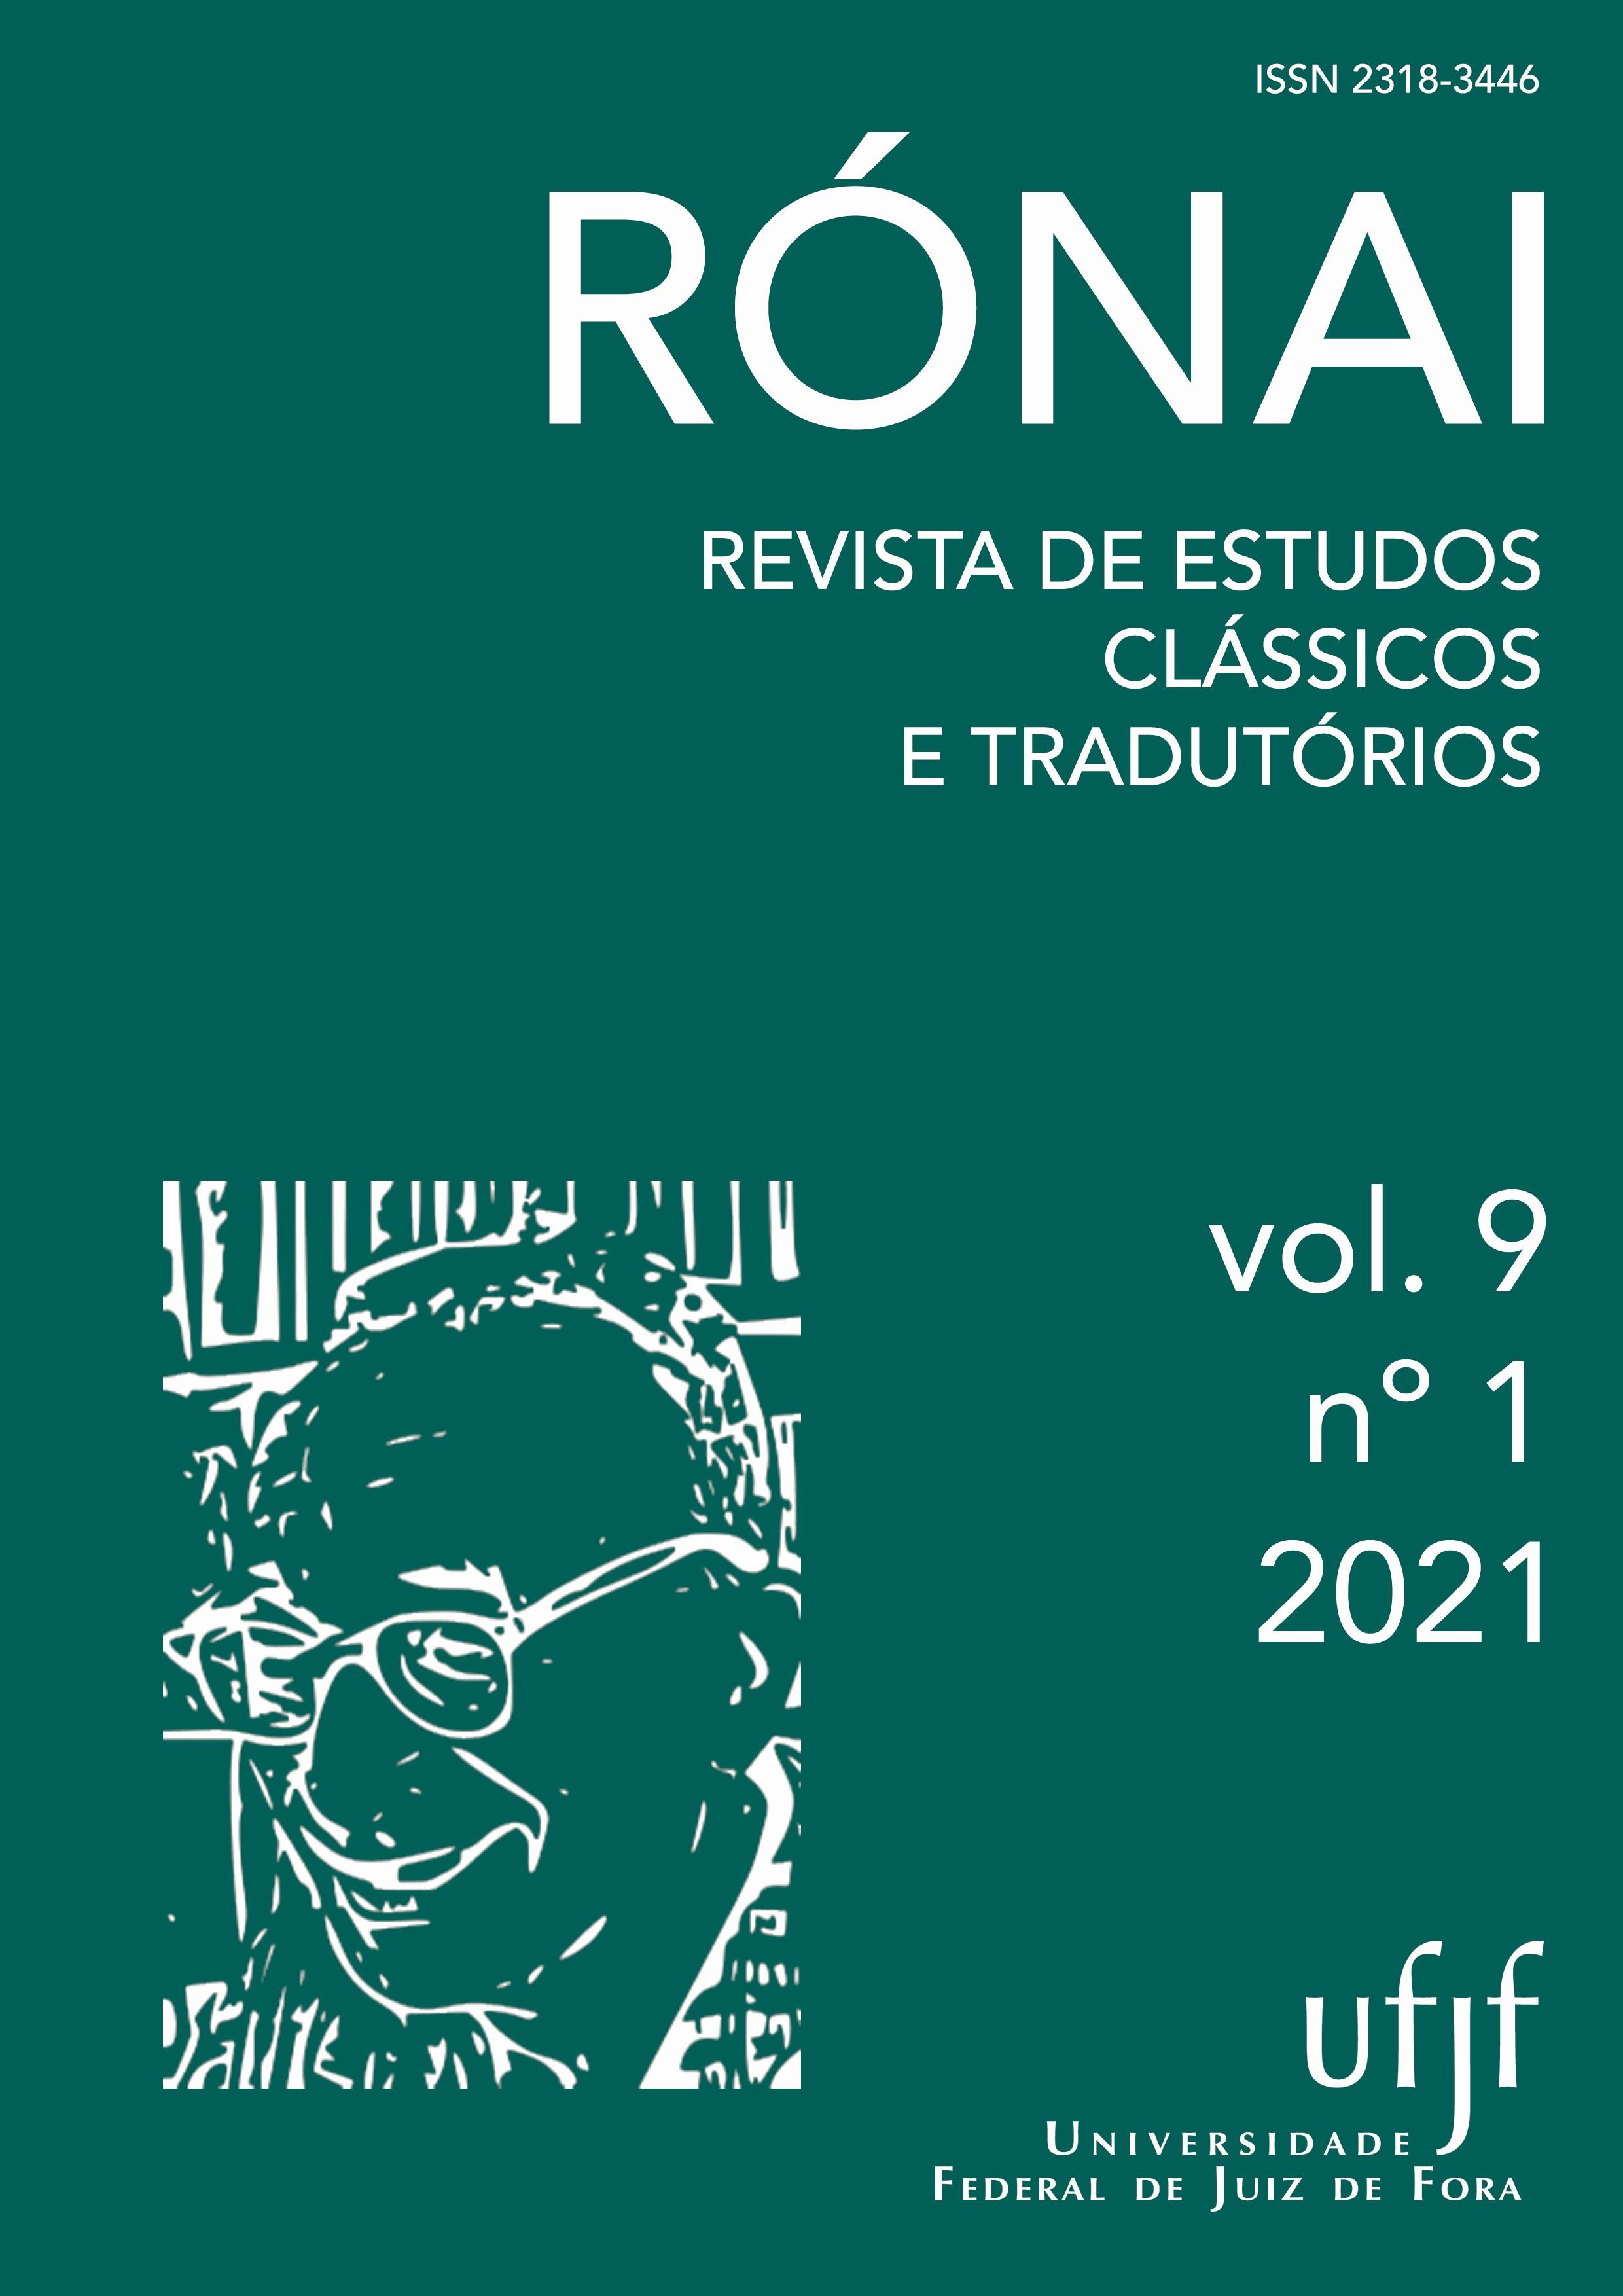 Capa do volume 9, número 1, do ano de 2021 da revista Rónai - Revista de Estudos Clássicos e Tradutórios